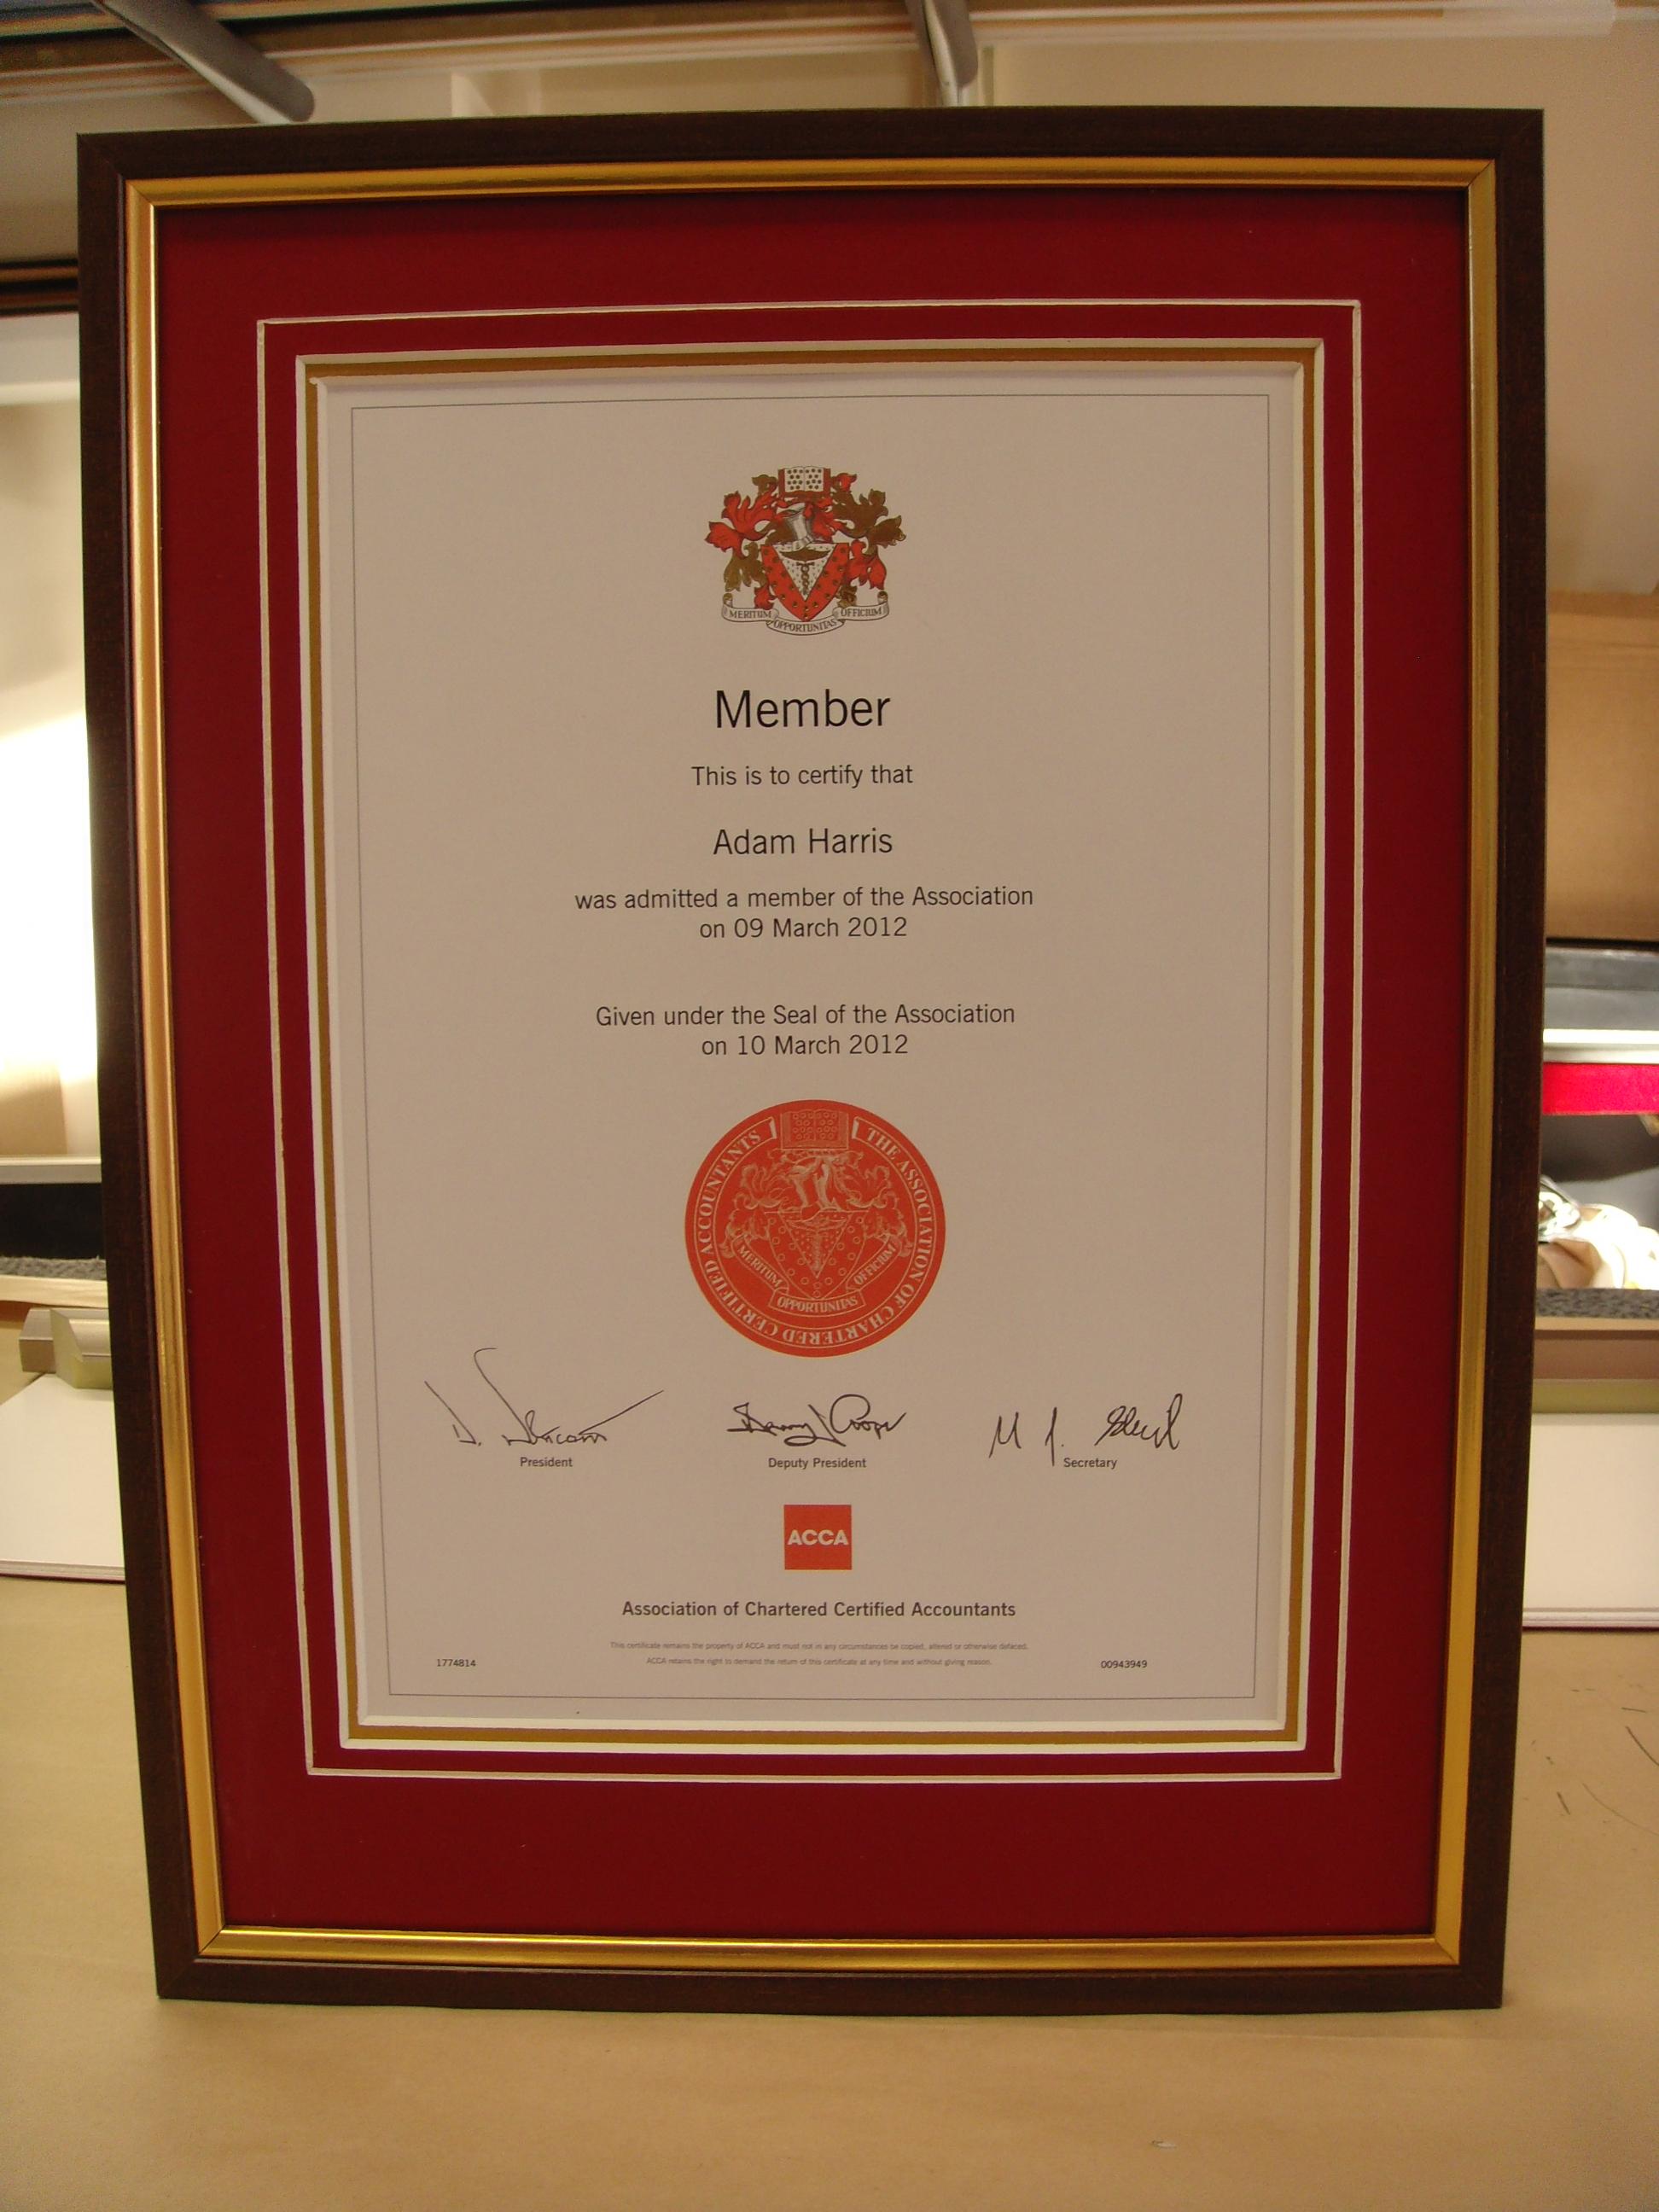 Official Diplomas & Certificates